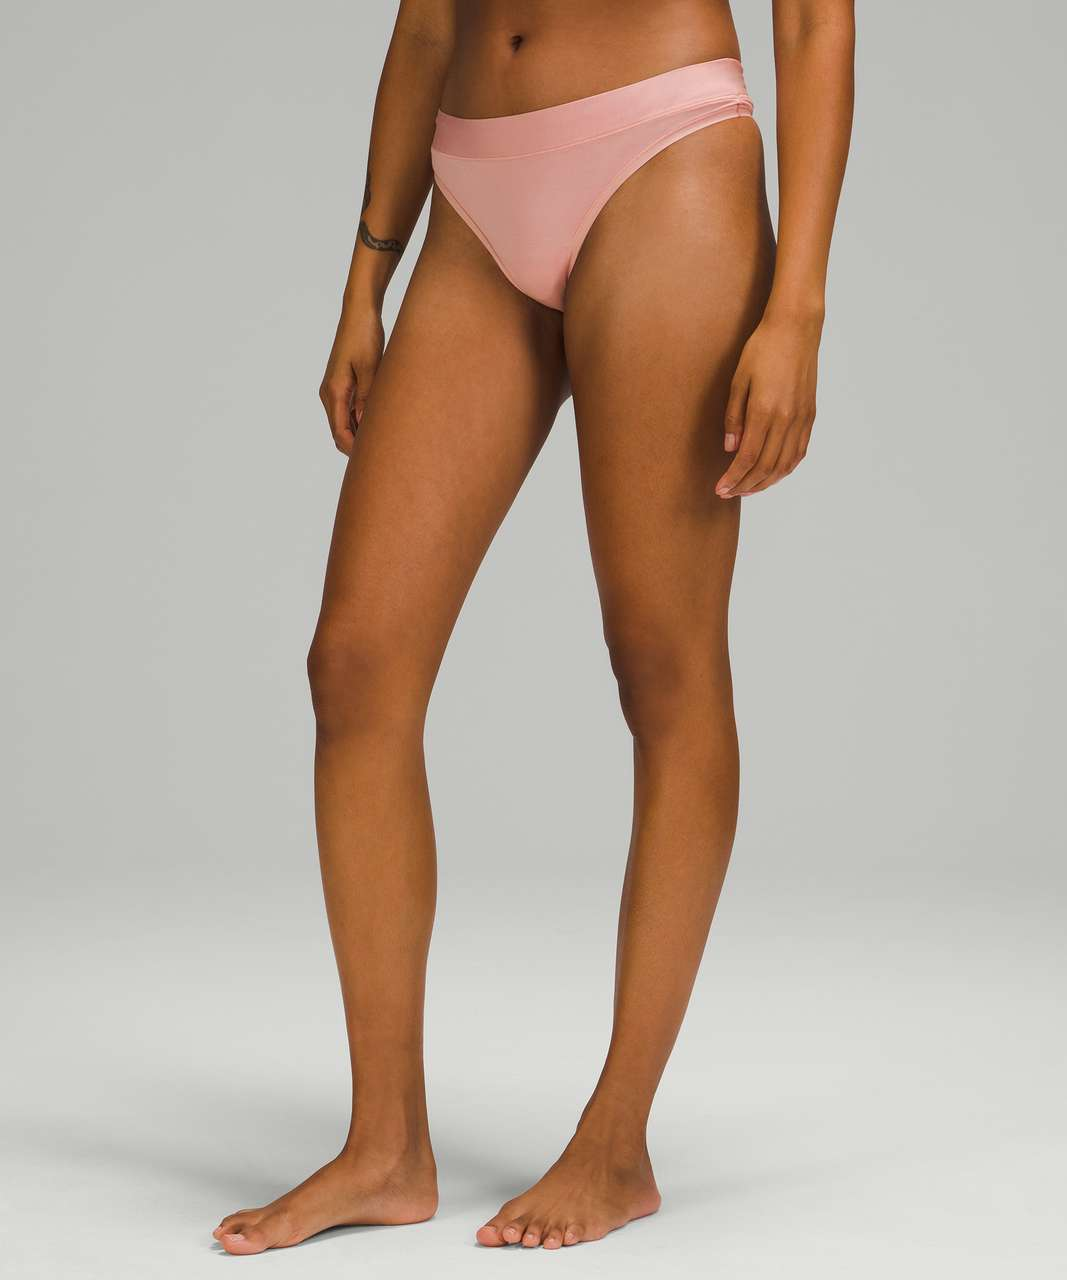 Lululemon UnderEase Mid-Rise Thong Underwear - Pink Puff